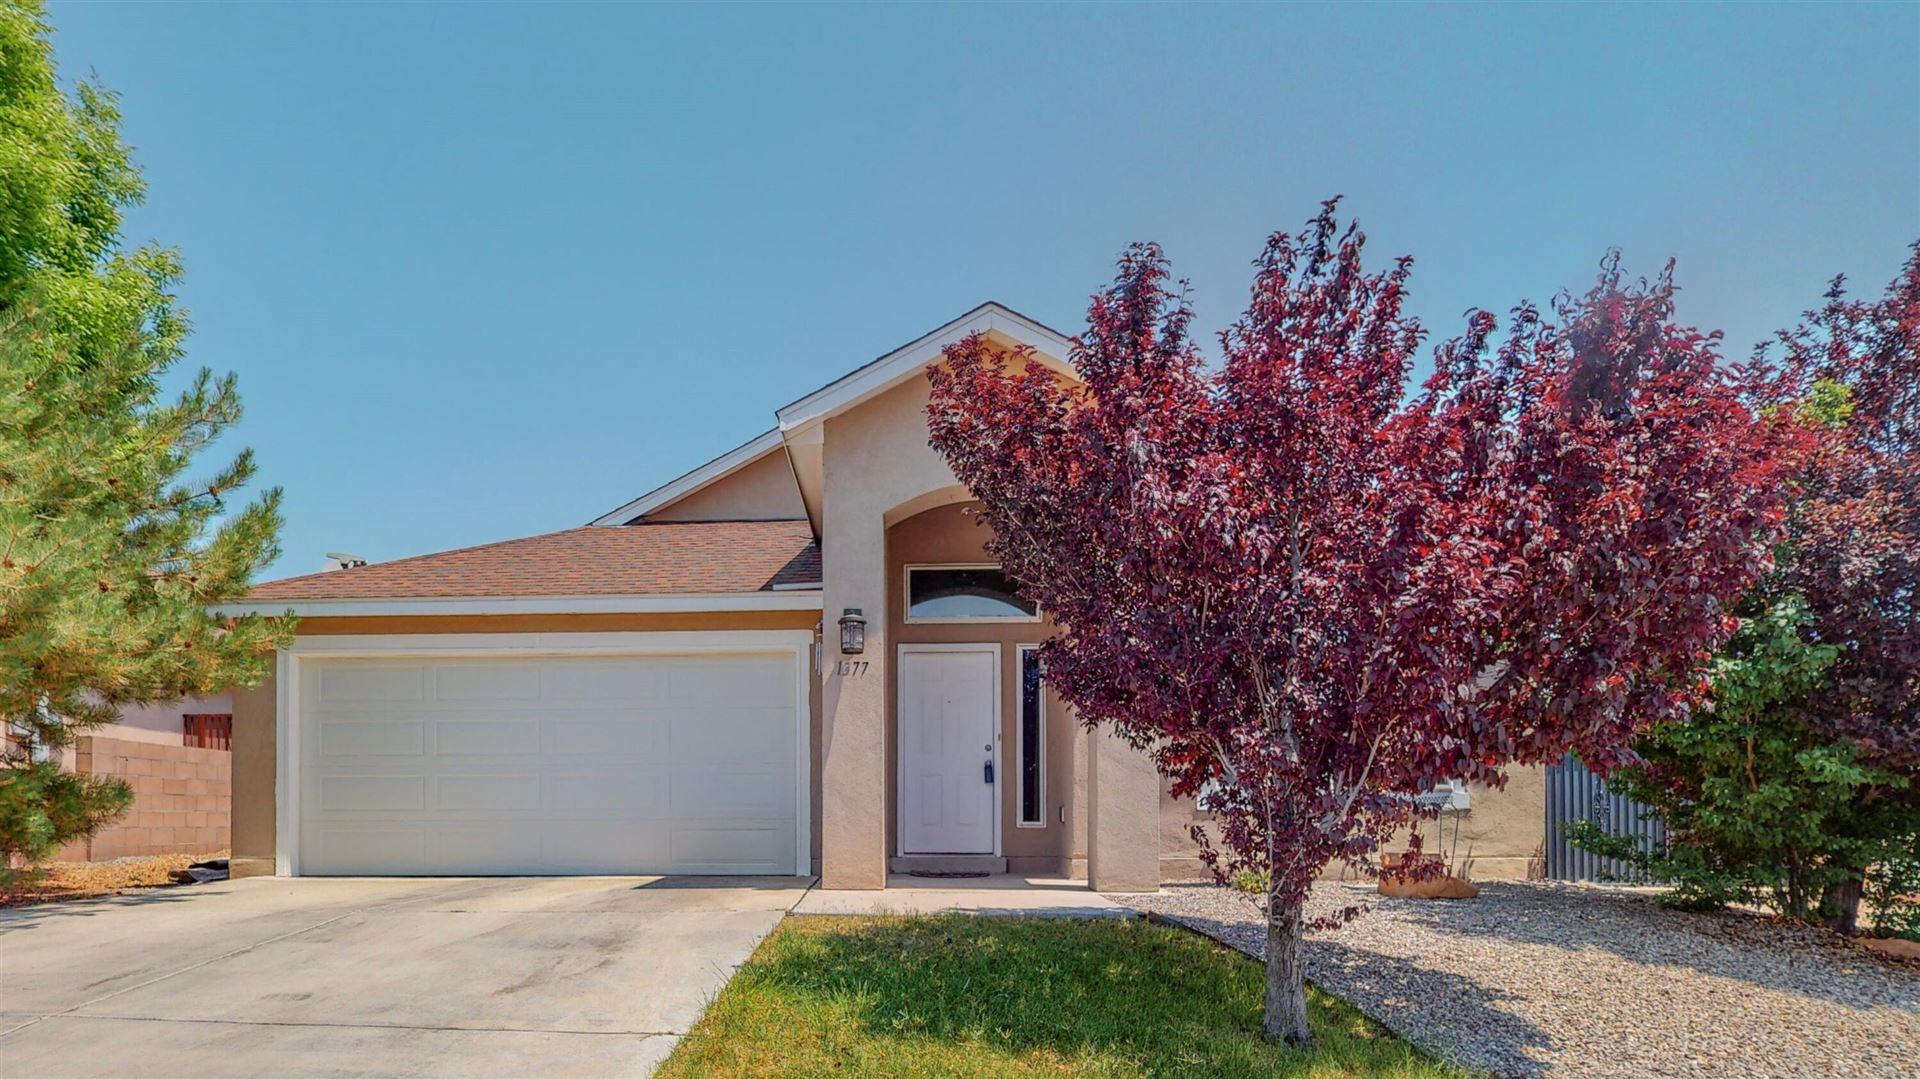 Photo of 1377 REYNOSA Loop SE, Rio Rancho, NM 87124 (MLS # 994705)